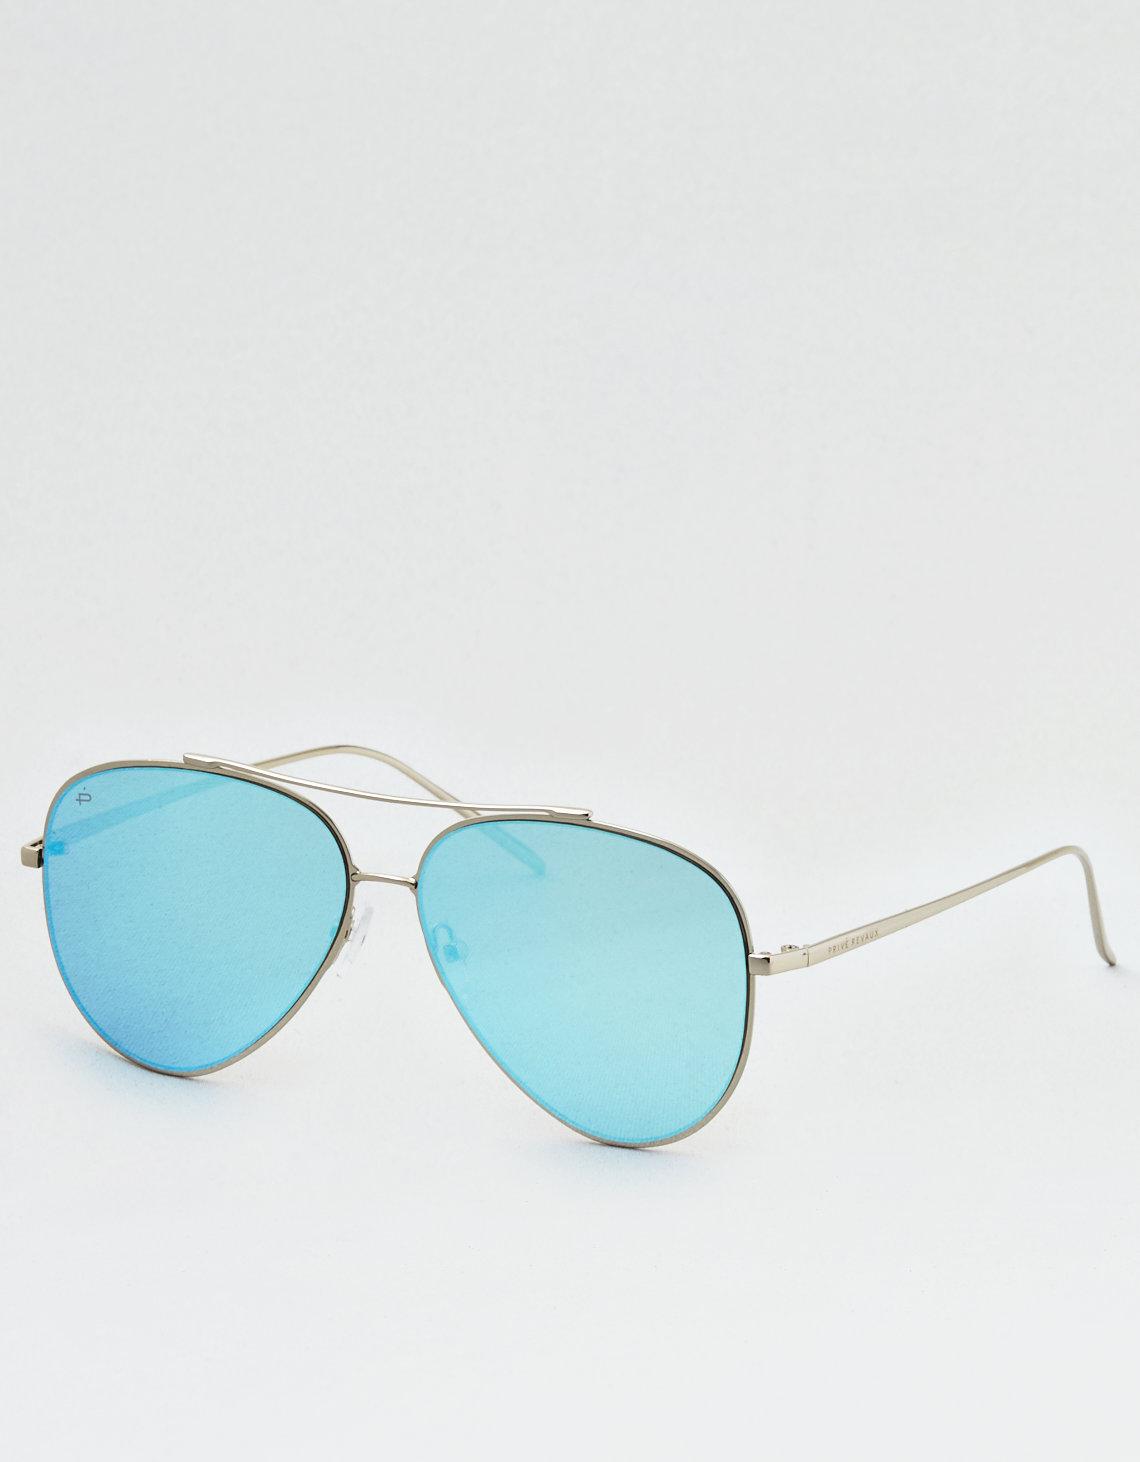 a59e43023e27 Privé Revaux The Aphrodite Sunglasses , Blue   American Eagle Outfitters